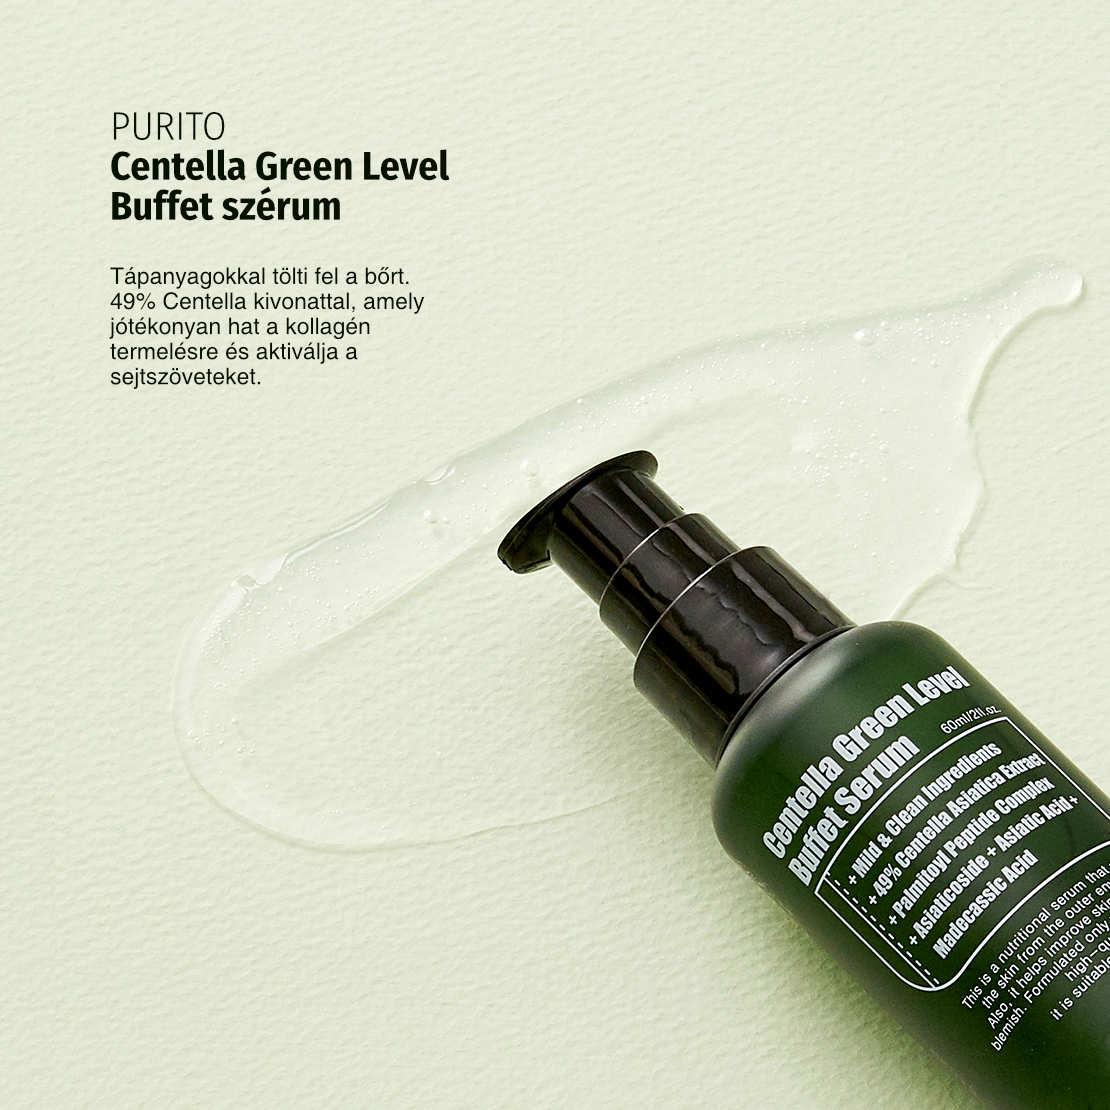 purito-Centella-Green-Level-buffet-szerum-01